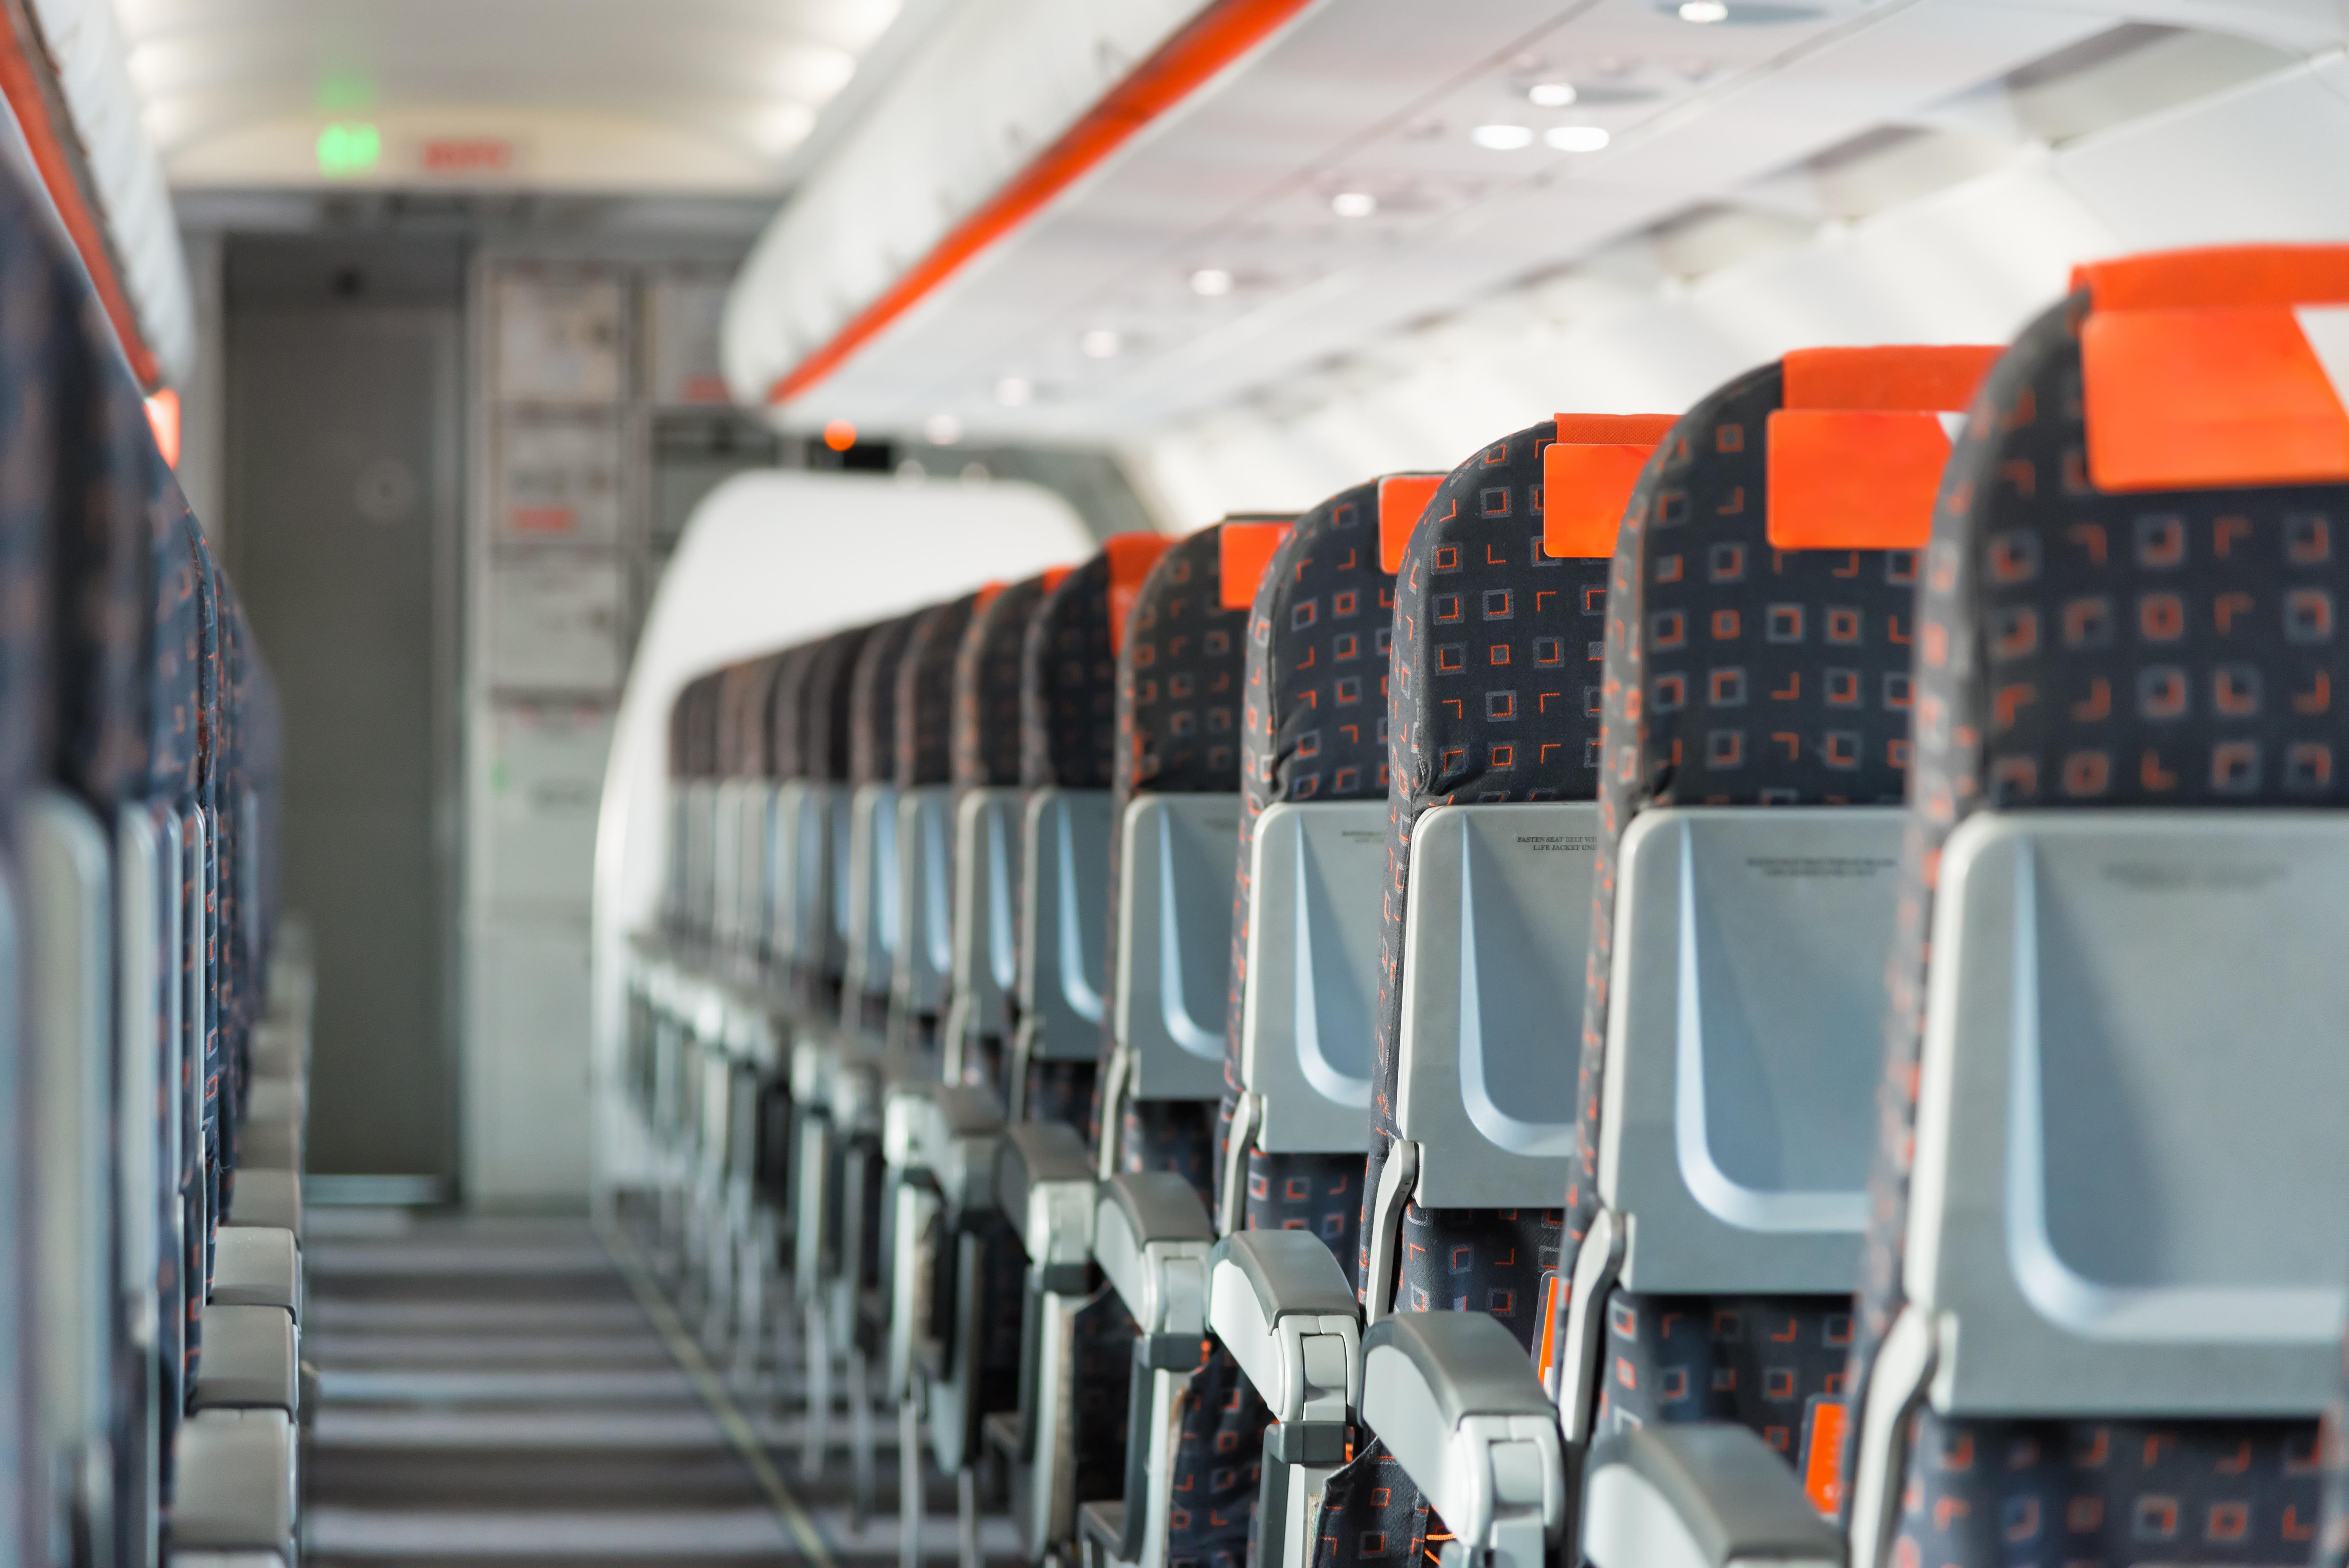 Boltaron aircraft interiors